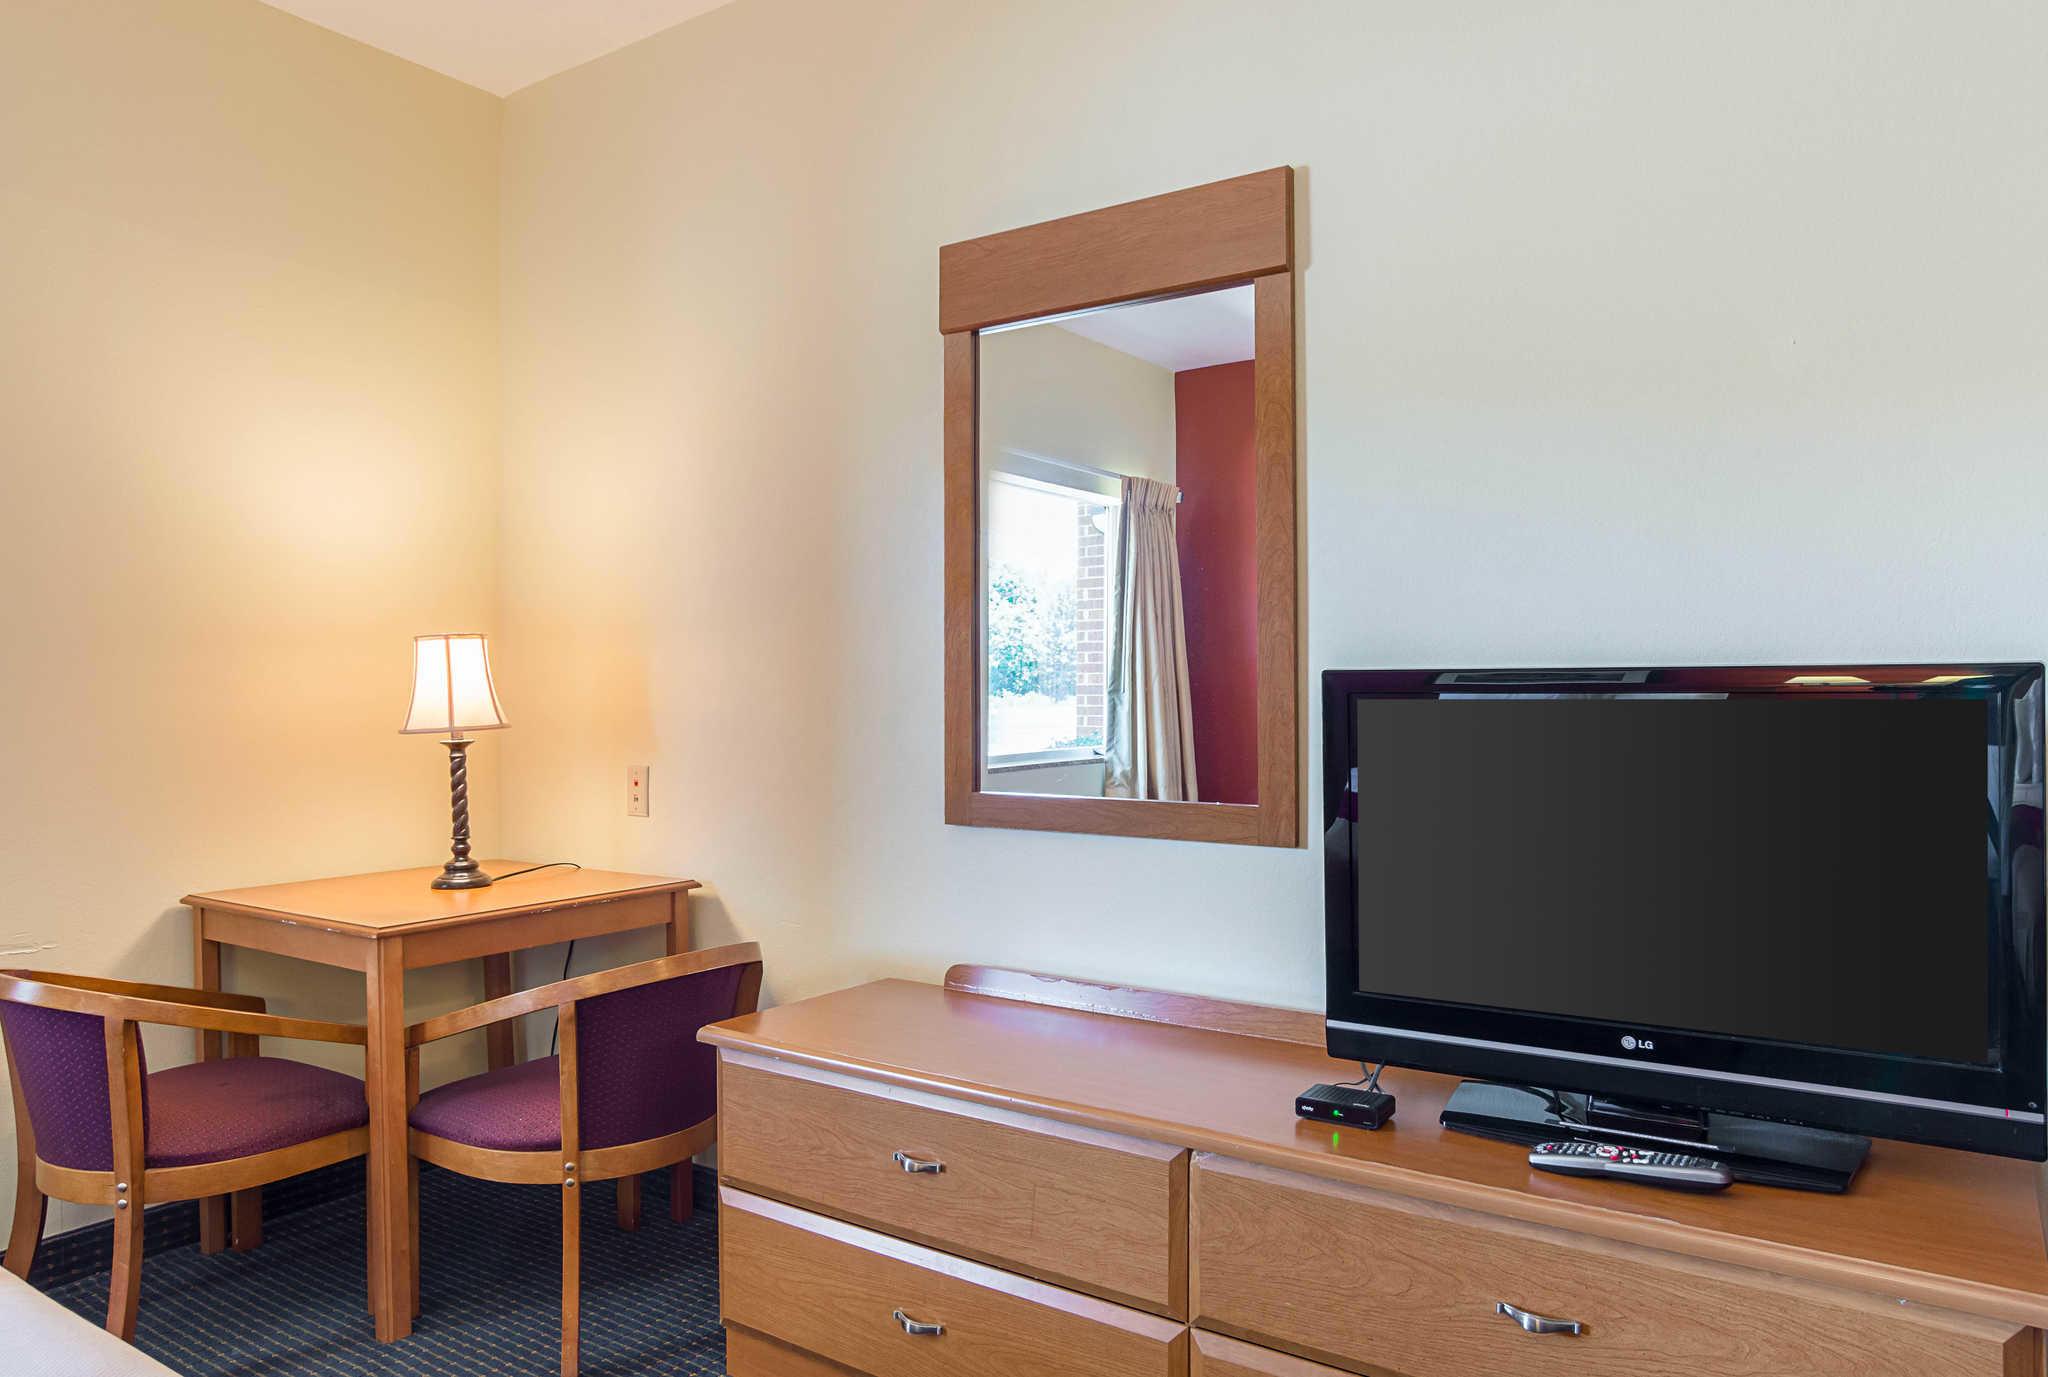 Econo Lodge Inn & Suites Pritchard Road North Little Rock image 11